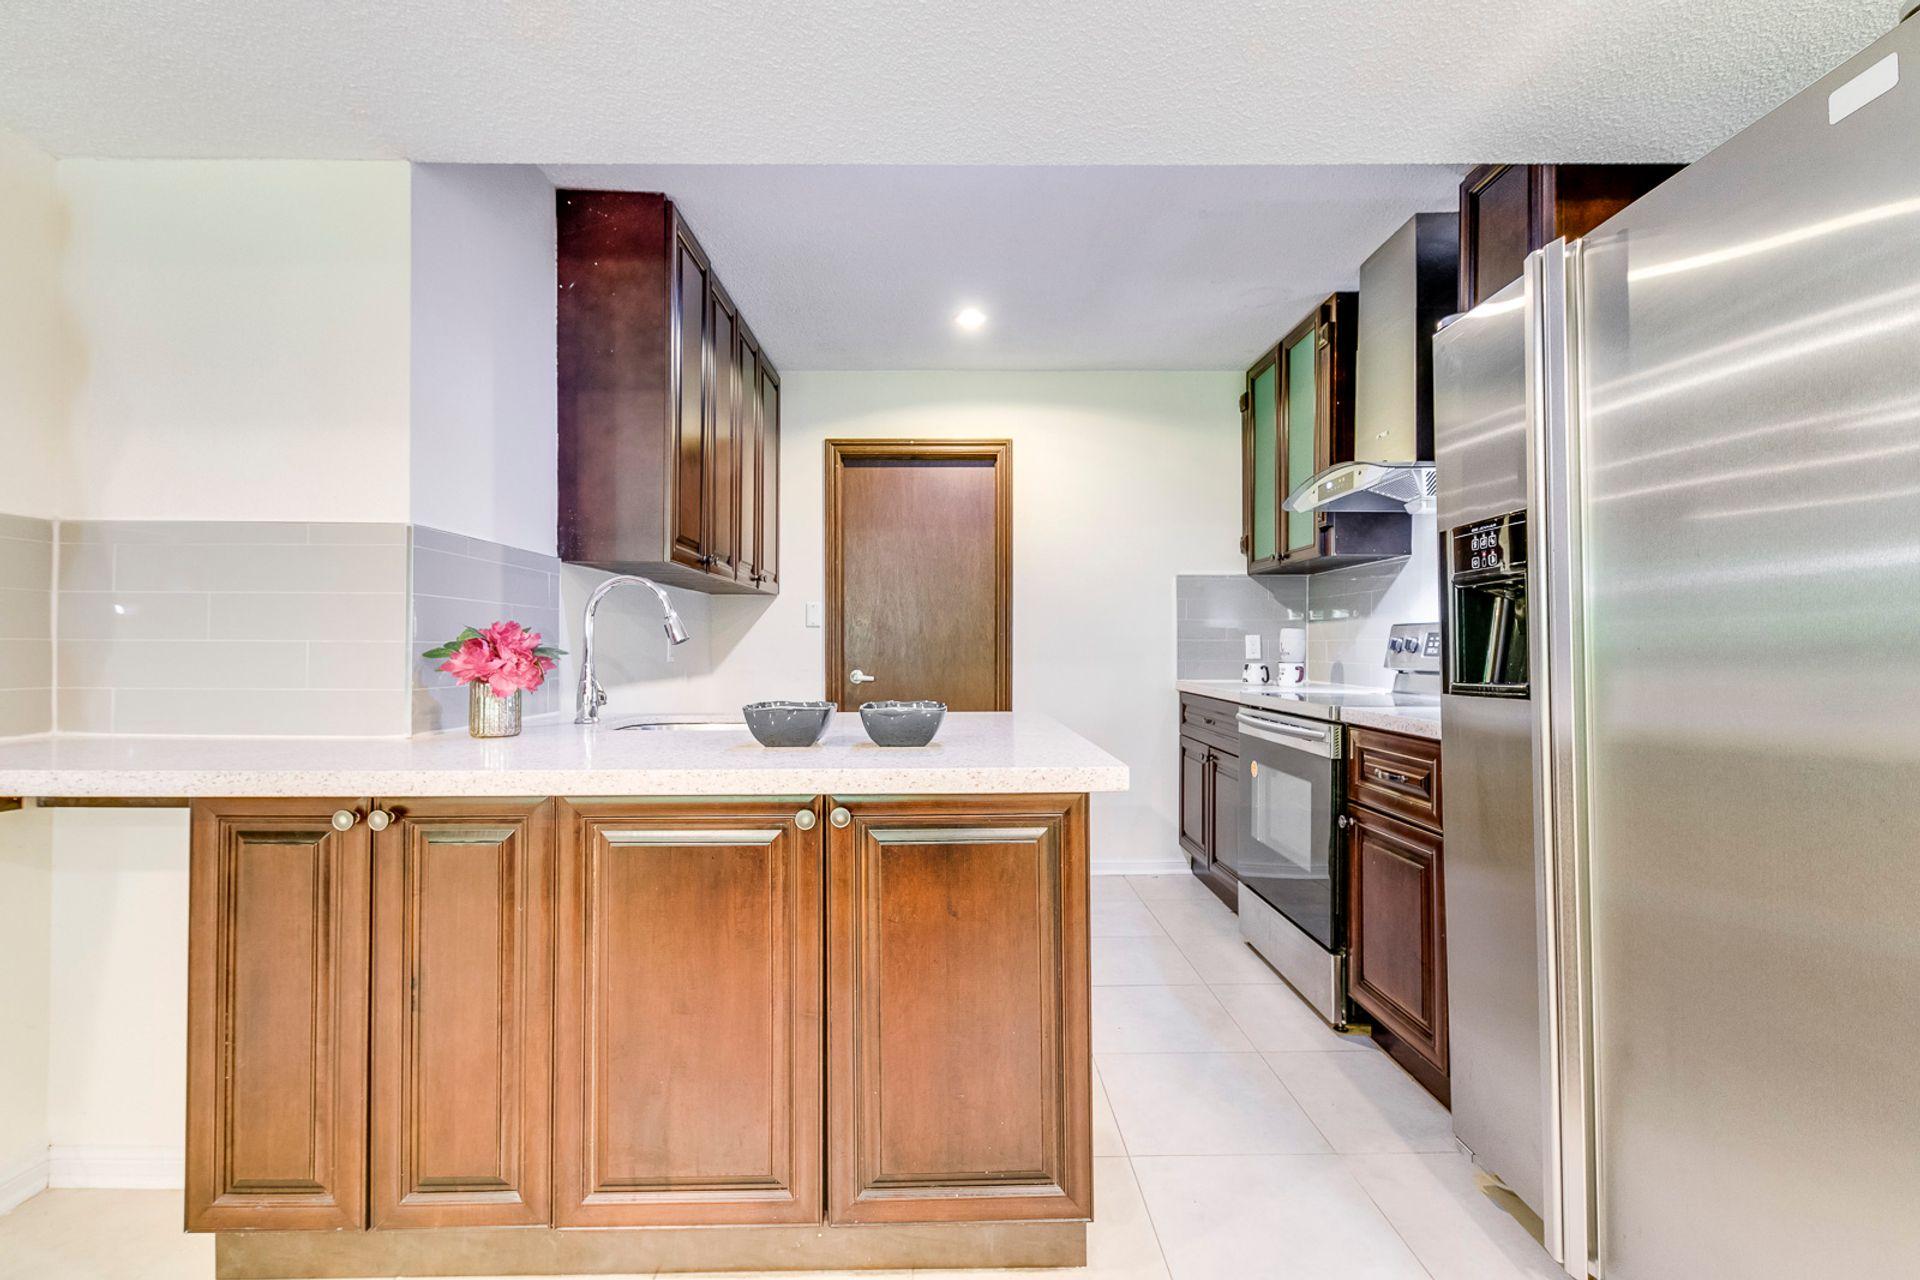 2nd Kitchen - 2421 Jarvis St, Mississauga - Elite3 & Team at 2421 Jarvis Street, Airport Corporate, Mississauga